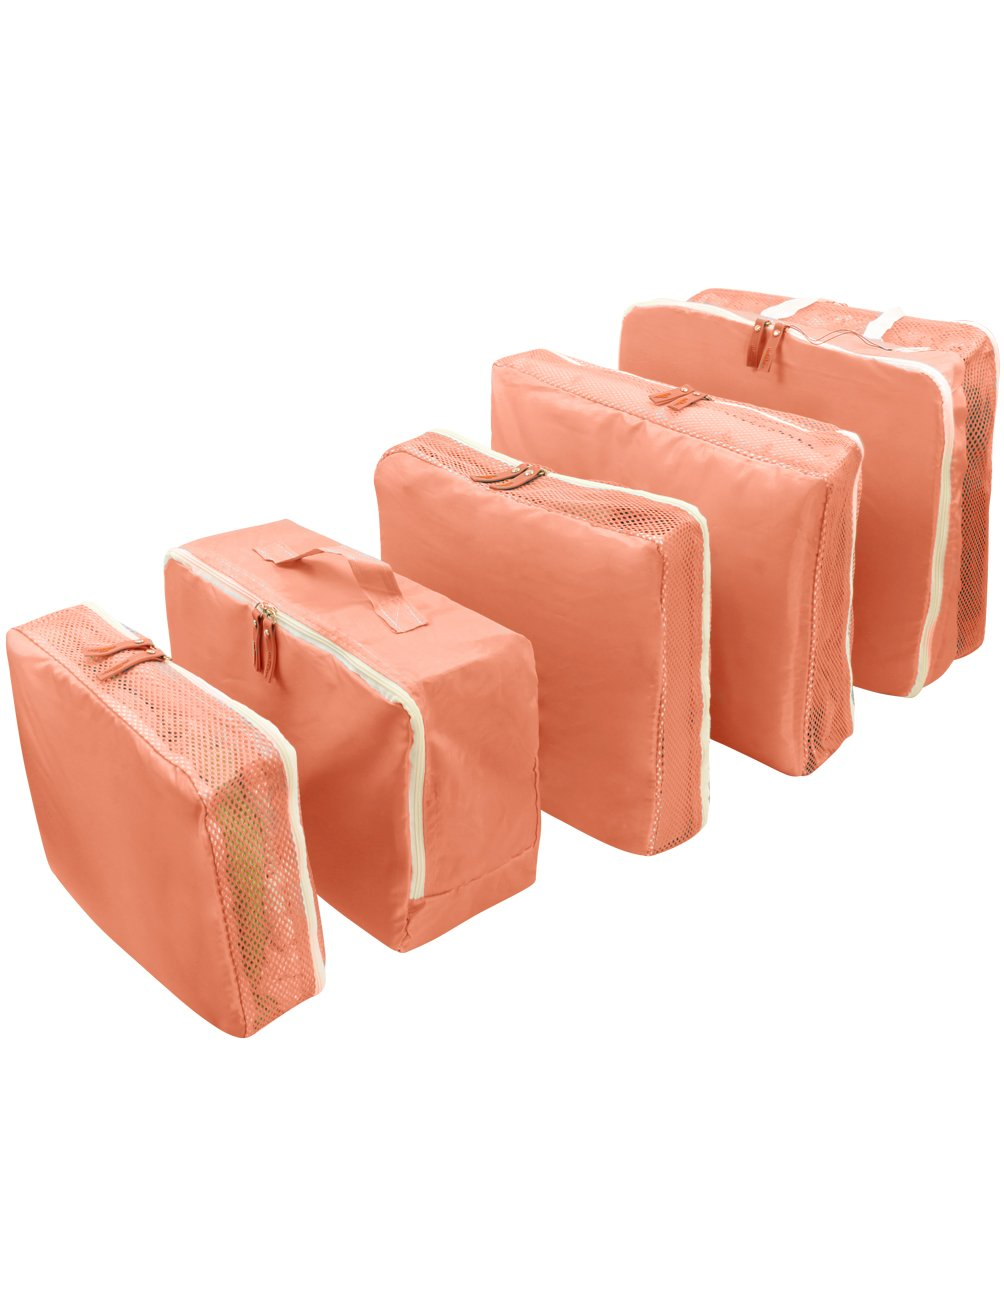 Easy Travel Quintuple Travel Luggage Packing Organizer Bag Set (5 Pcs) - Peach